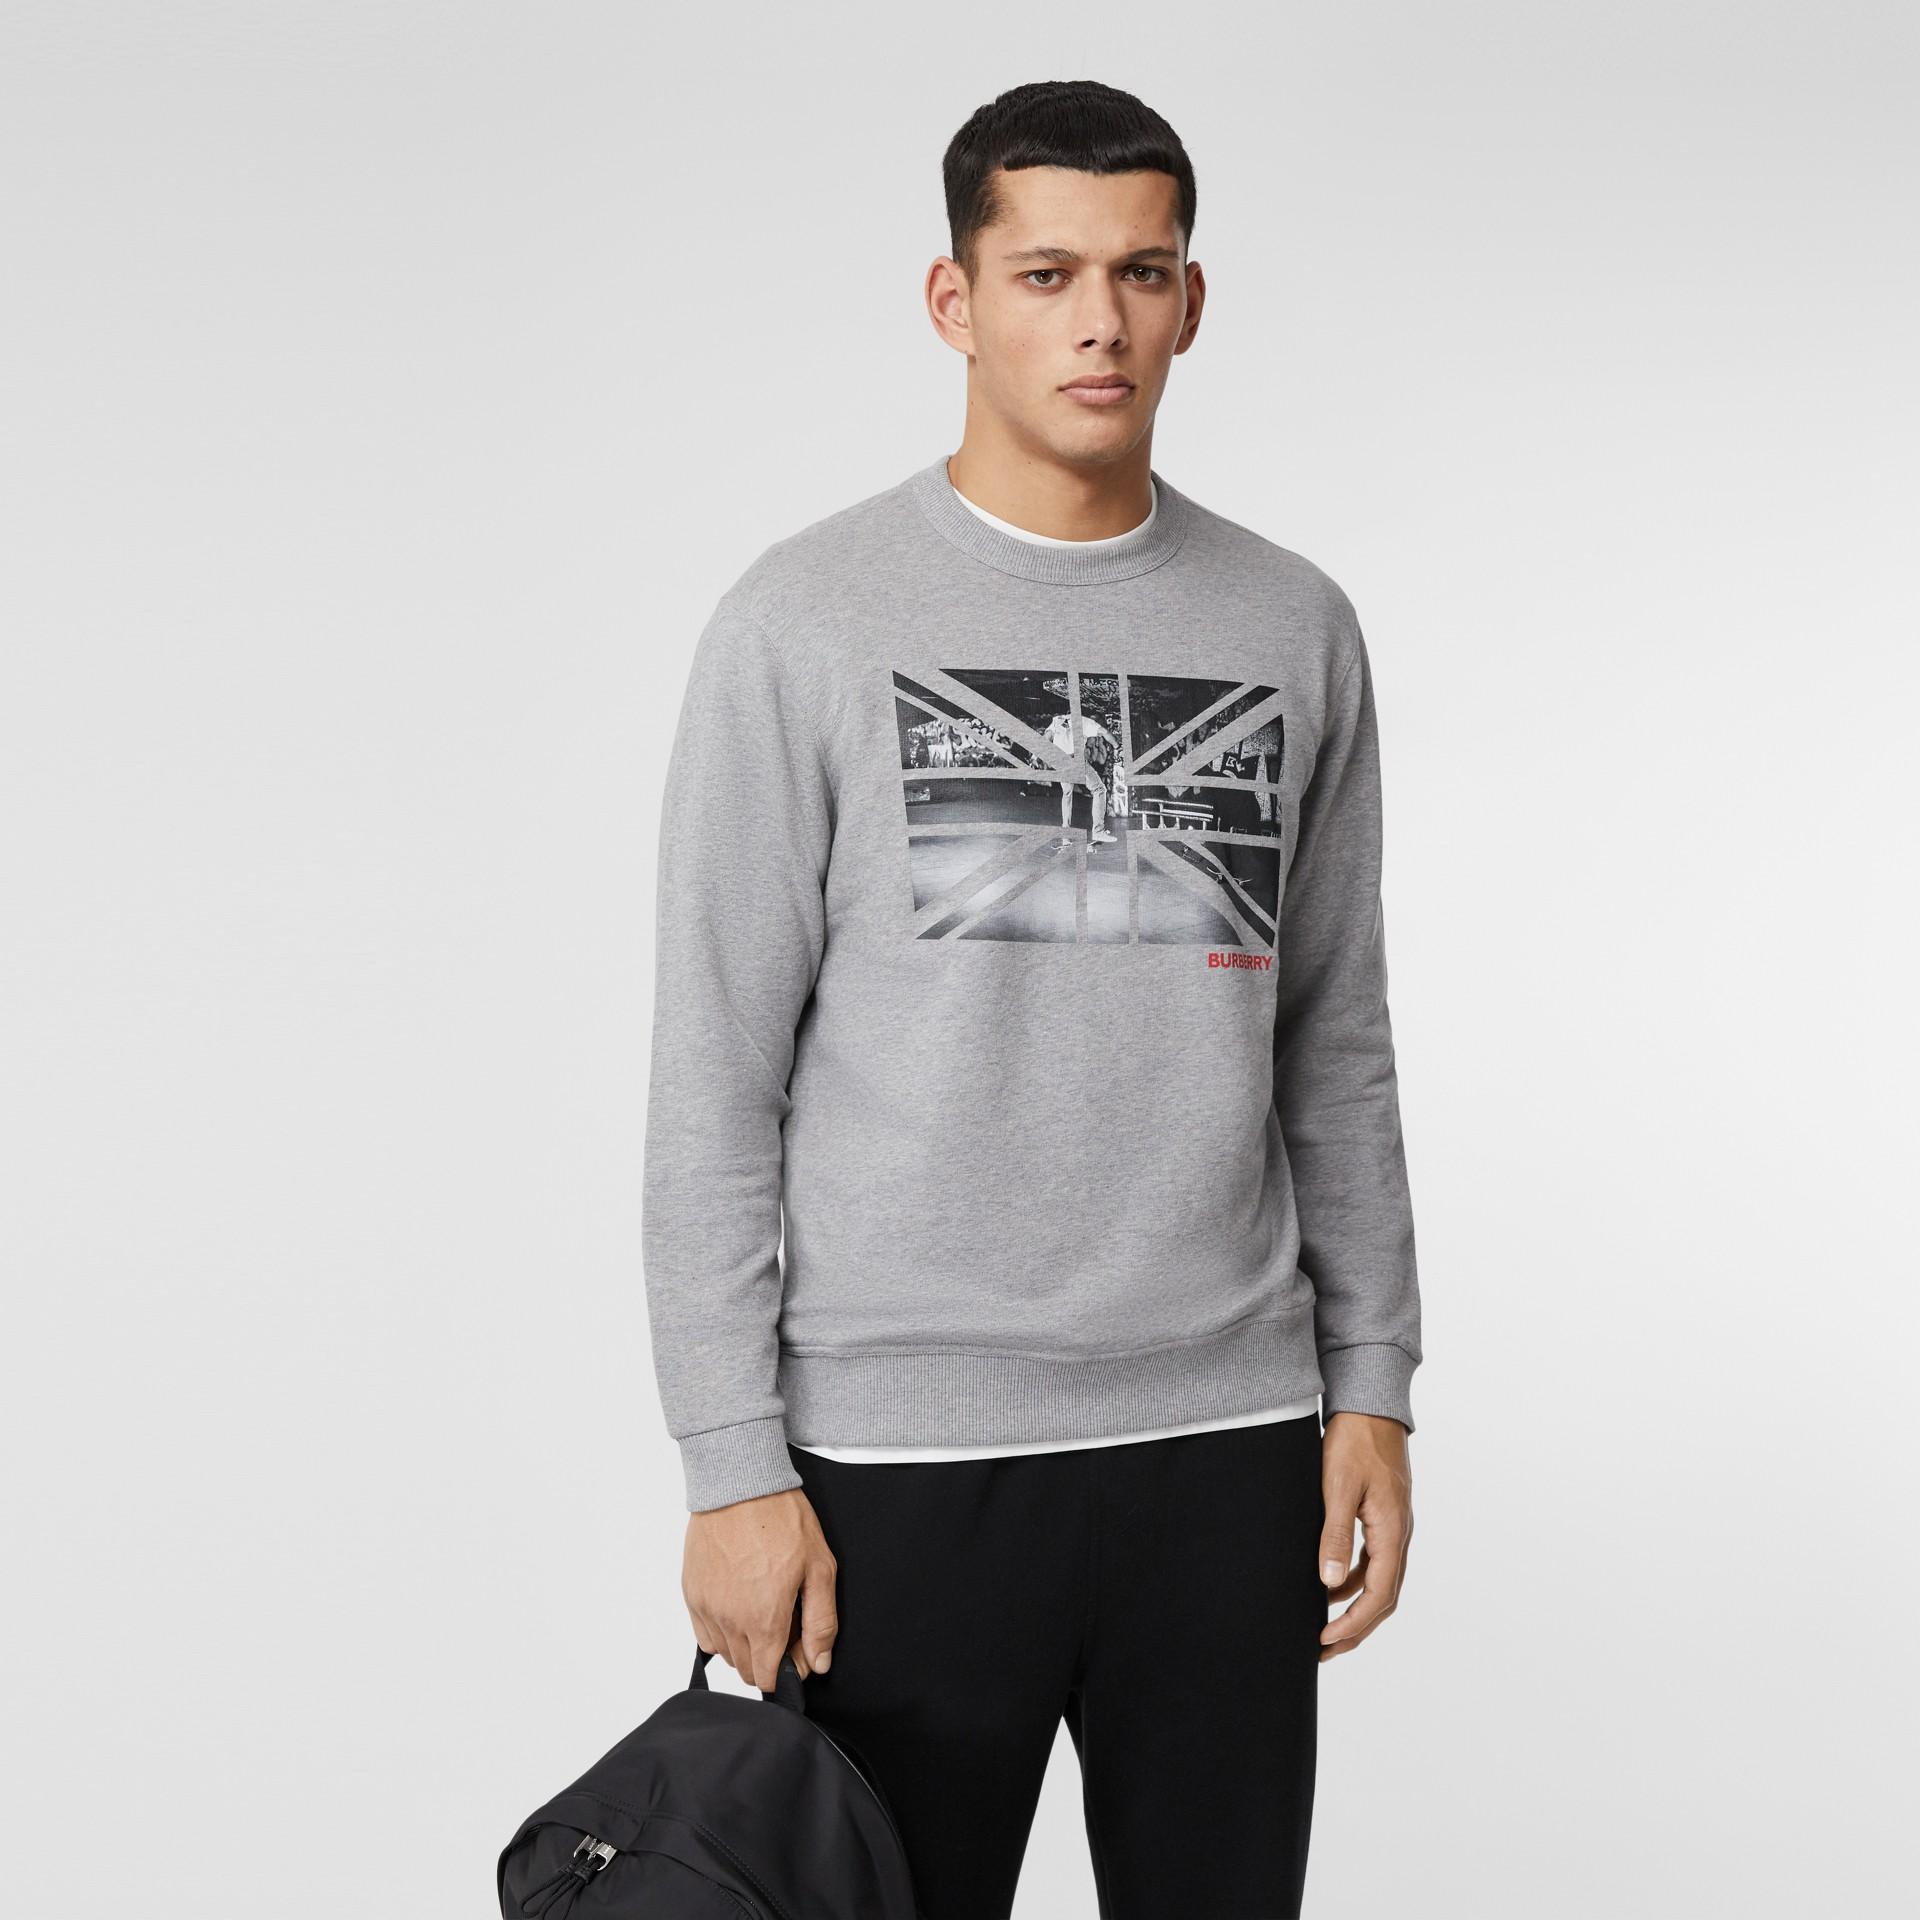 Union Jack Photo Print Cotton Sweatshirt in Pale Grey Melange - Men | Burberry - gallery image 0